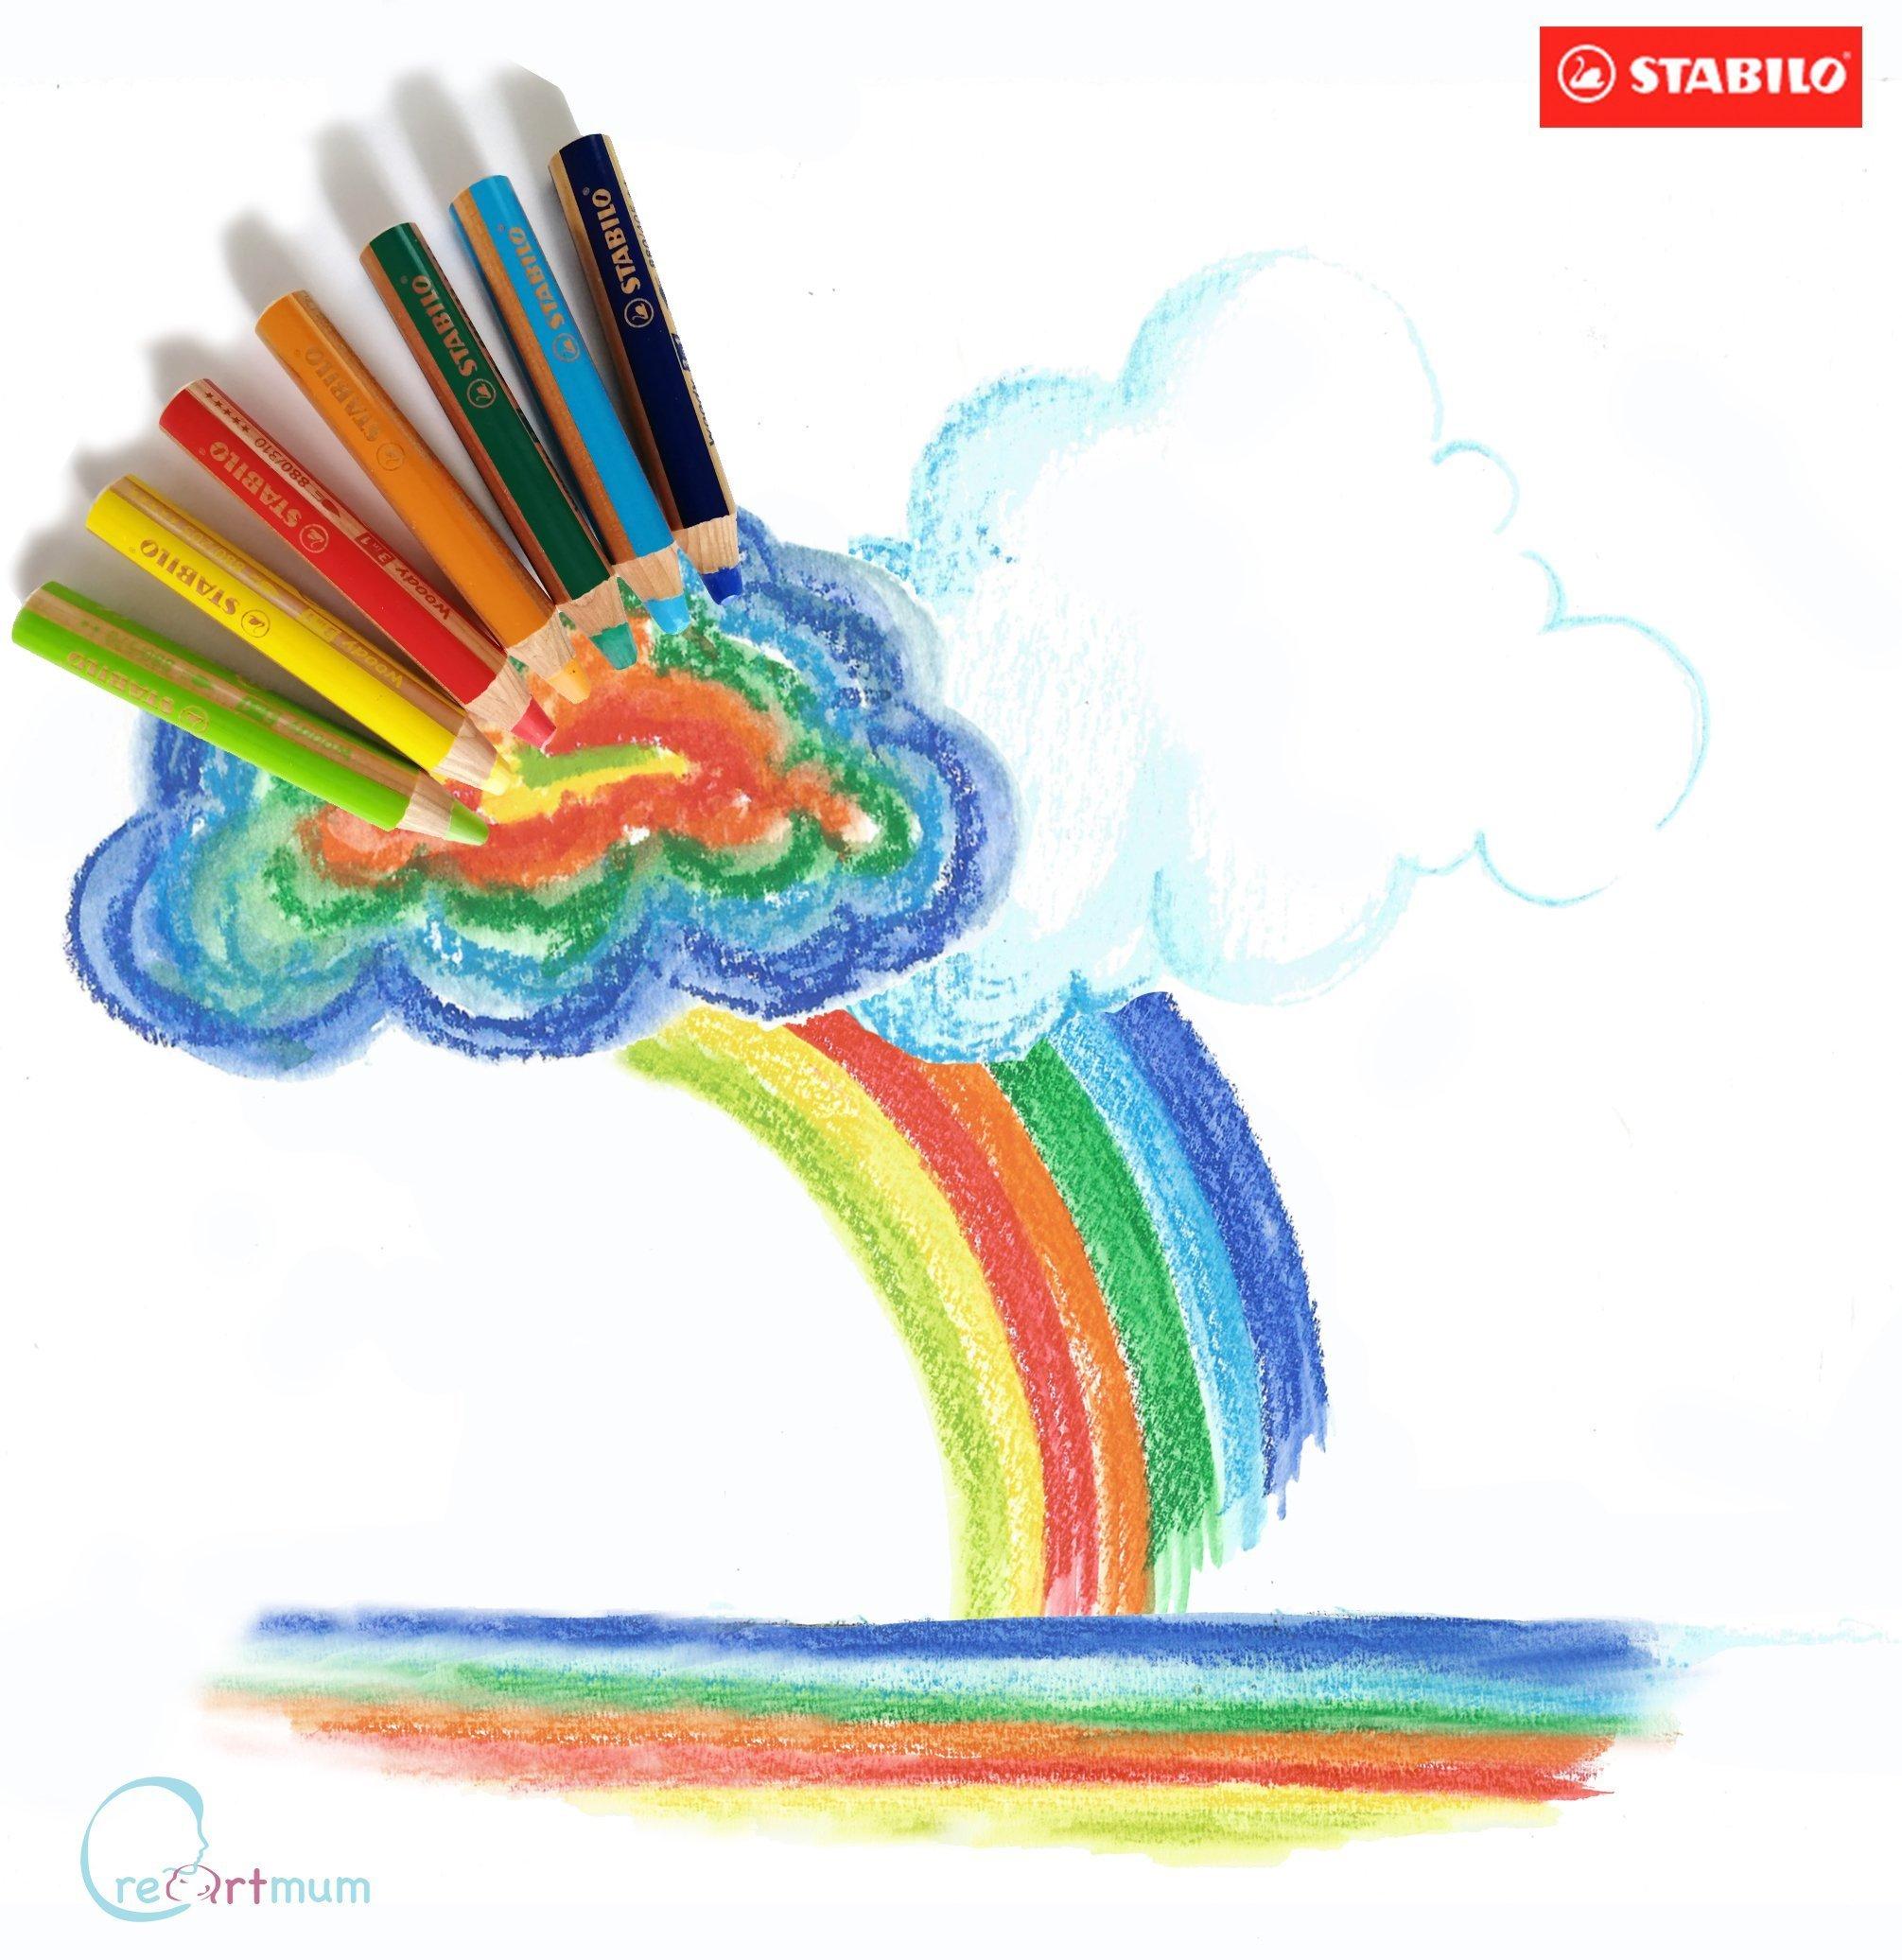 arcobaleno stabilo